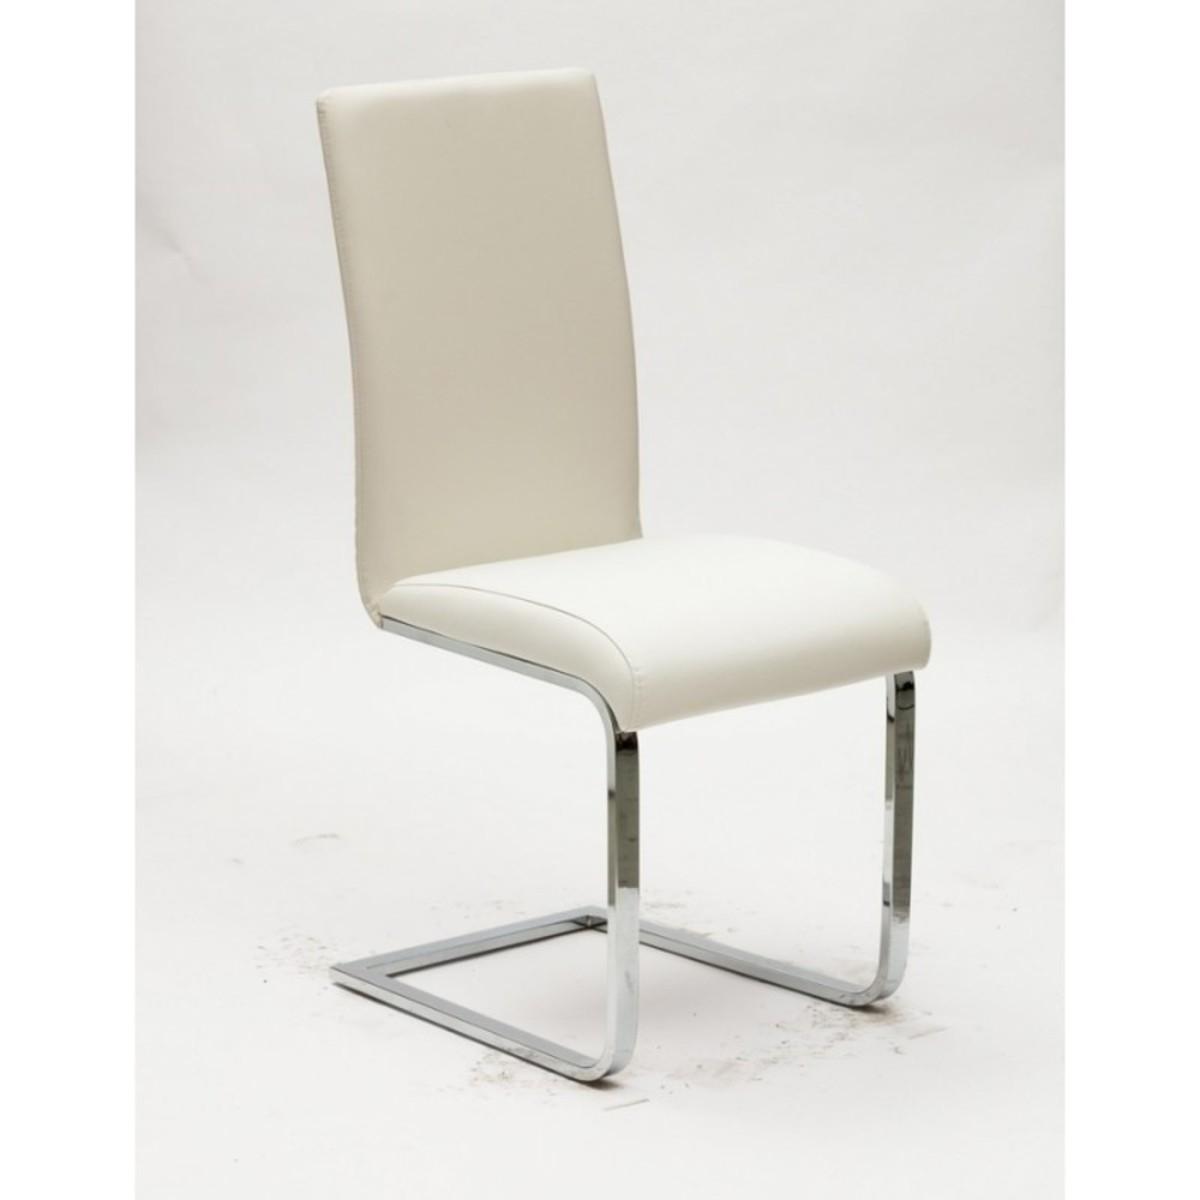 Sedia imbottita modello kant in promozione sedie a for Sedia sdraio imbottita prezzi